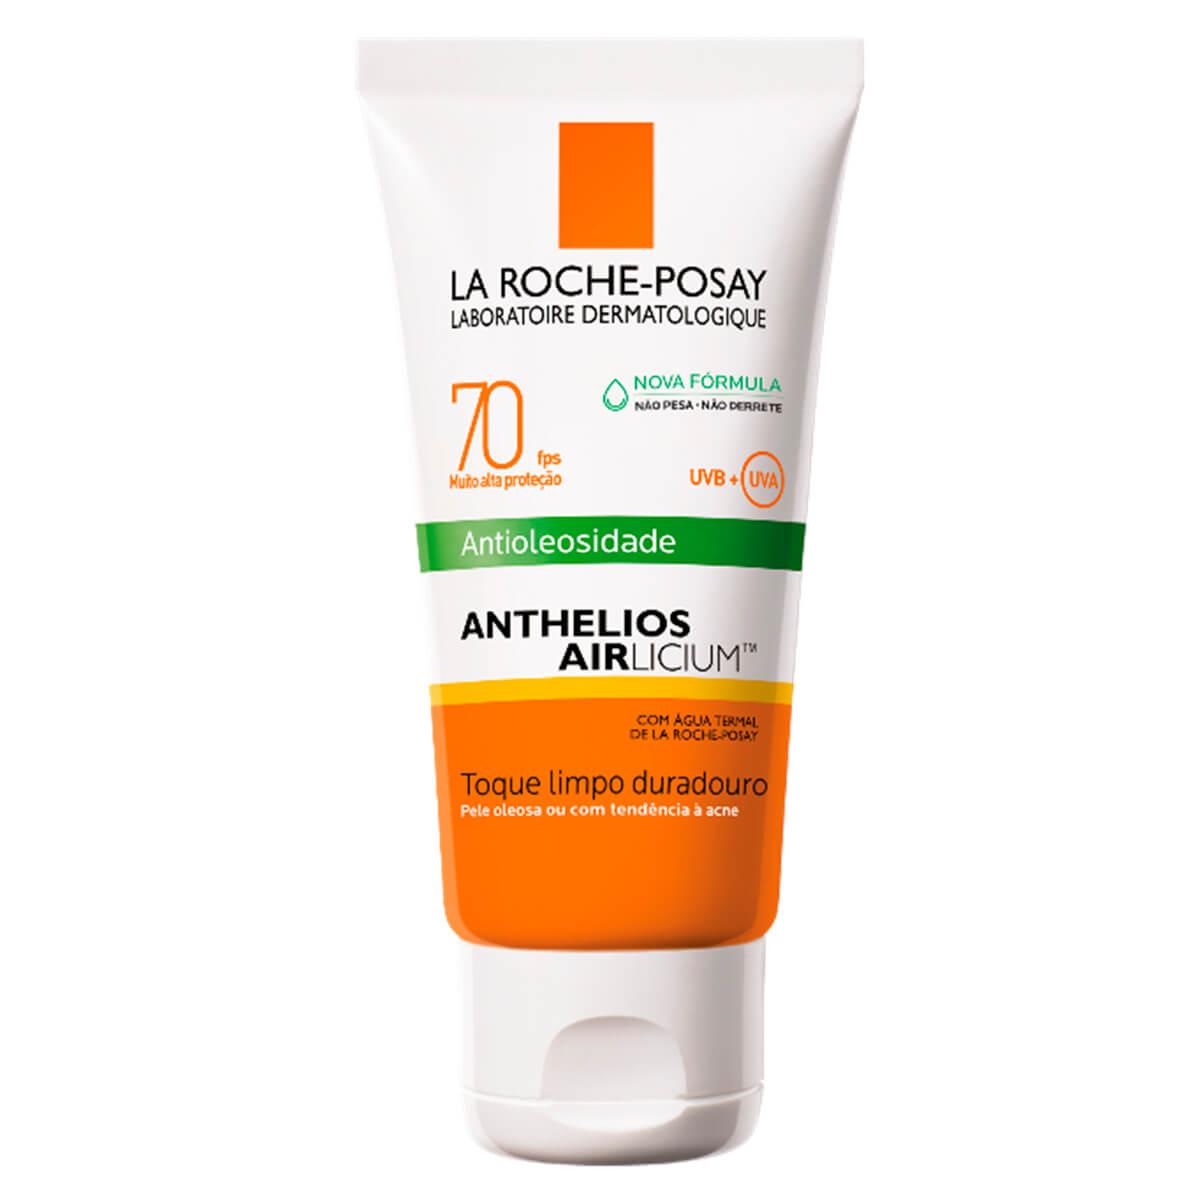 Protetor Solar Anthelios Airlicium Antioleosidade FPS70 50G La Roche-Posay 50g